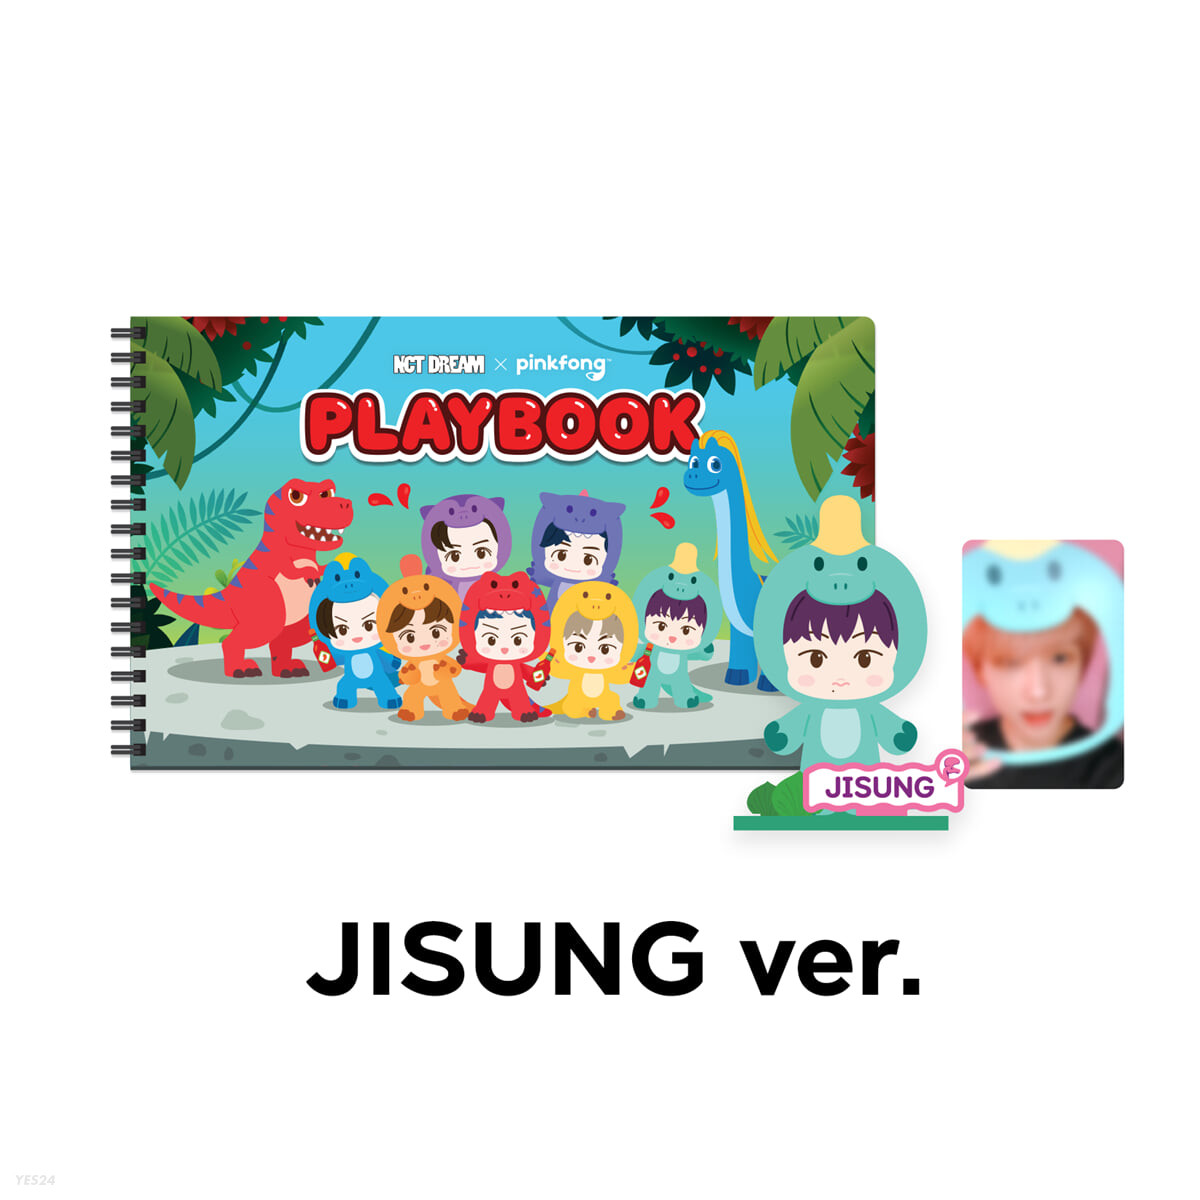 [JISUNG] PLAYBOOK SET - NCT DREAM X PINKFONG